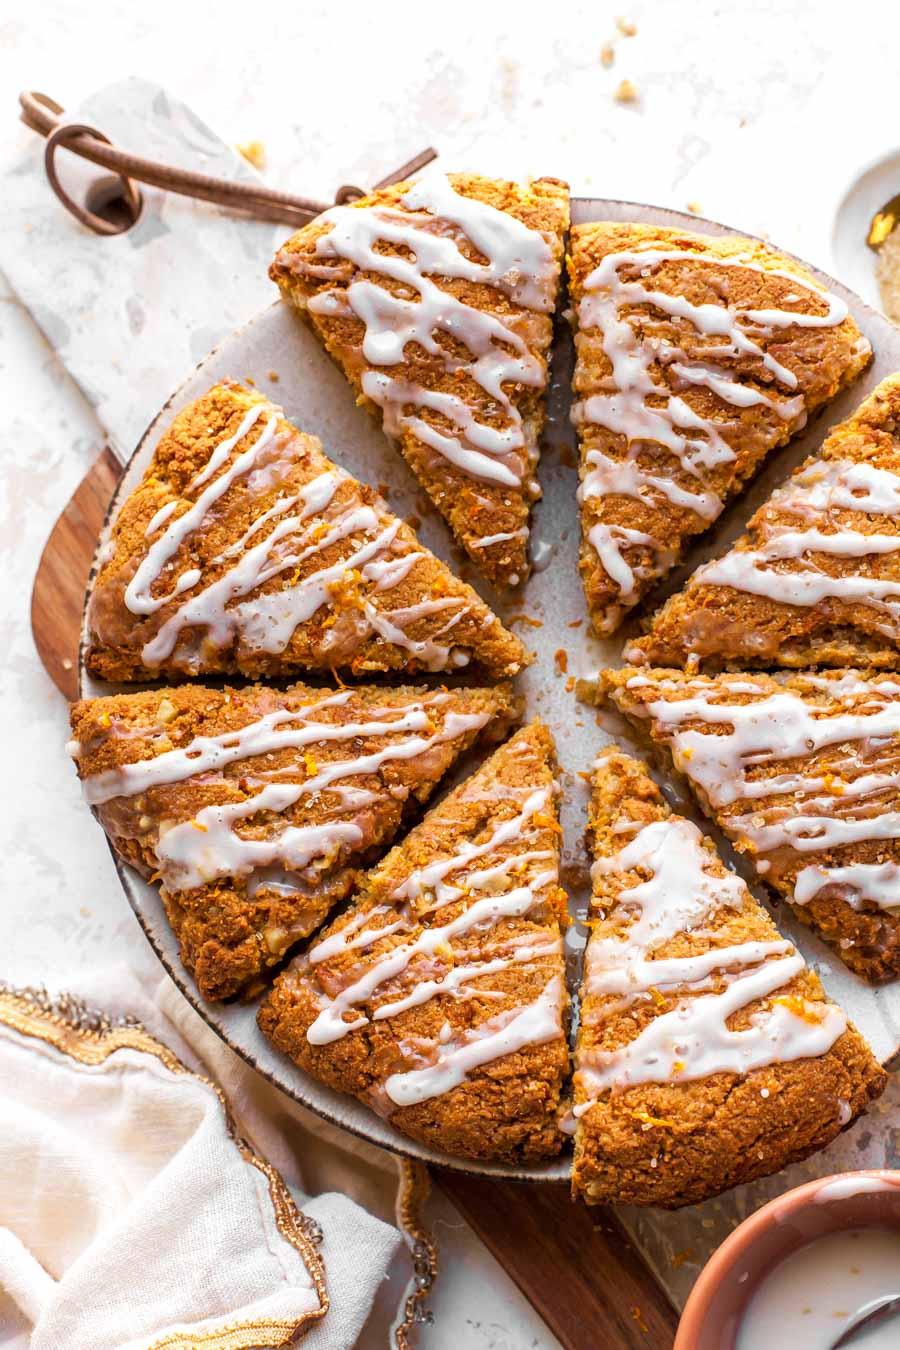 Carrot Cake Scones made with almond flour and orange glaze